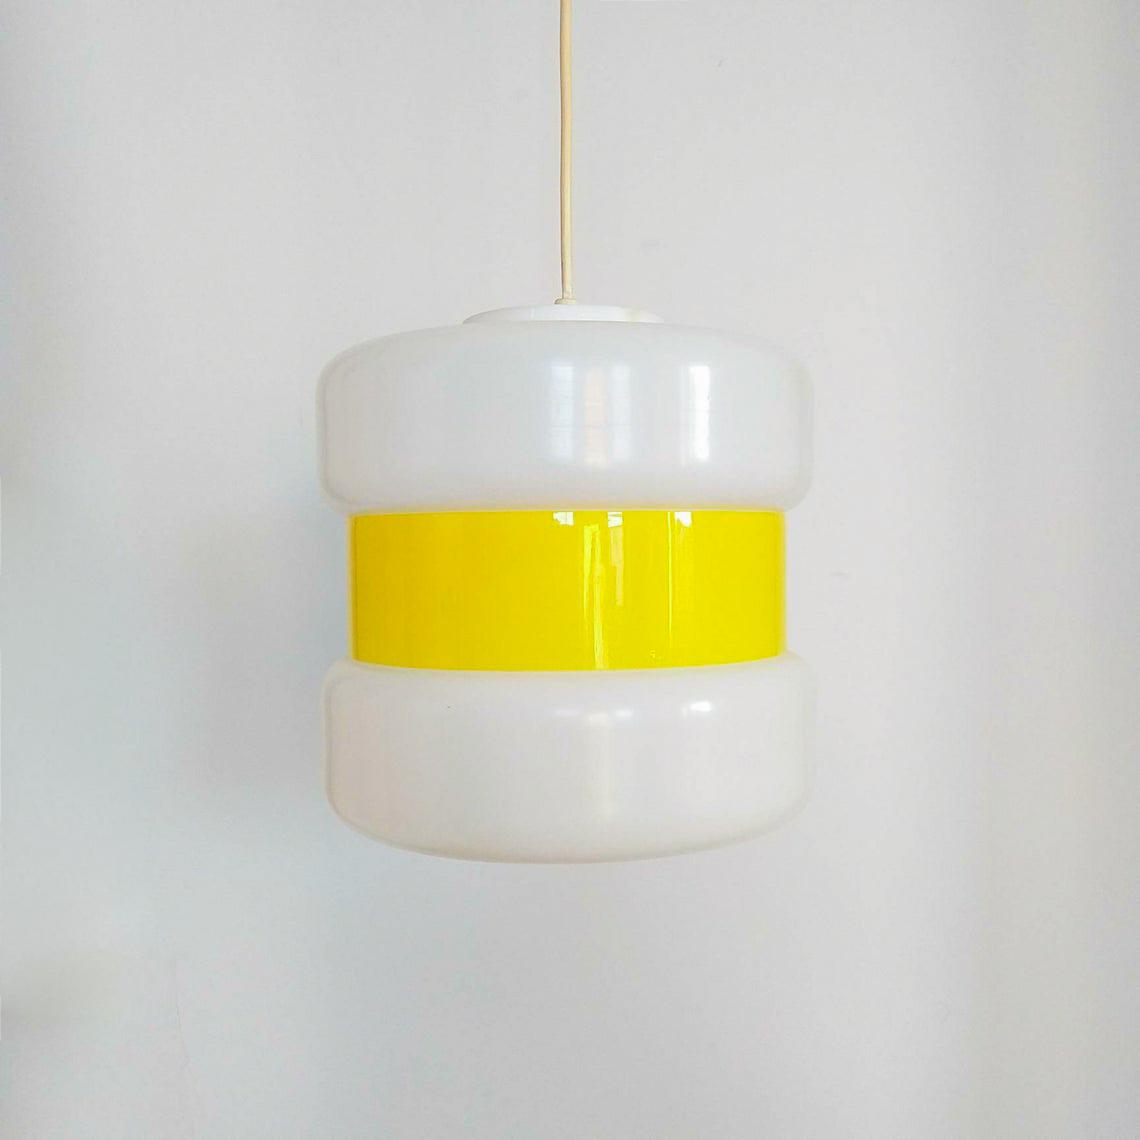 Vintage Guzzini Pendant Lamp, Space Age Ceiling Lihgt, Italian Design Lamp, 70s